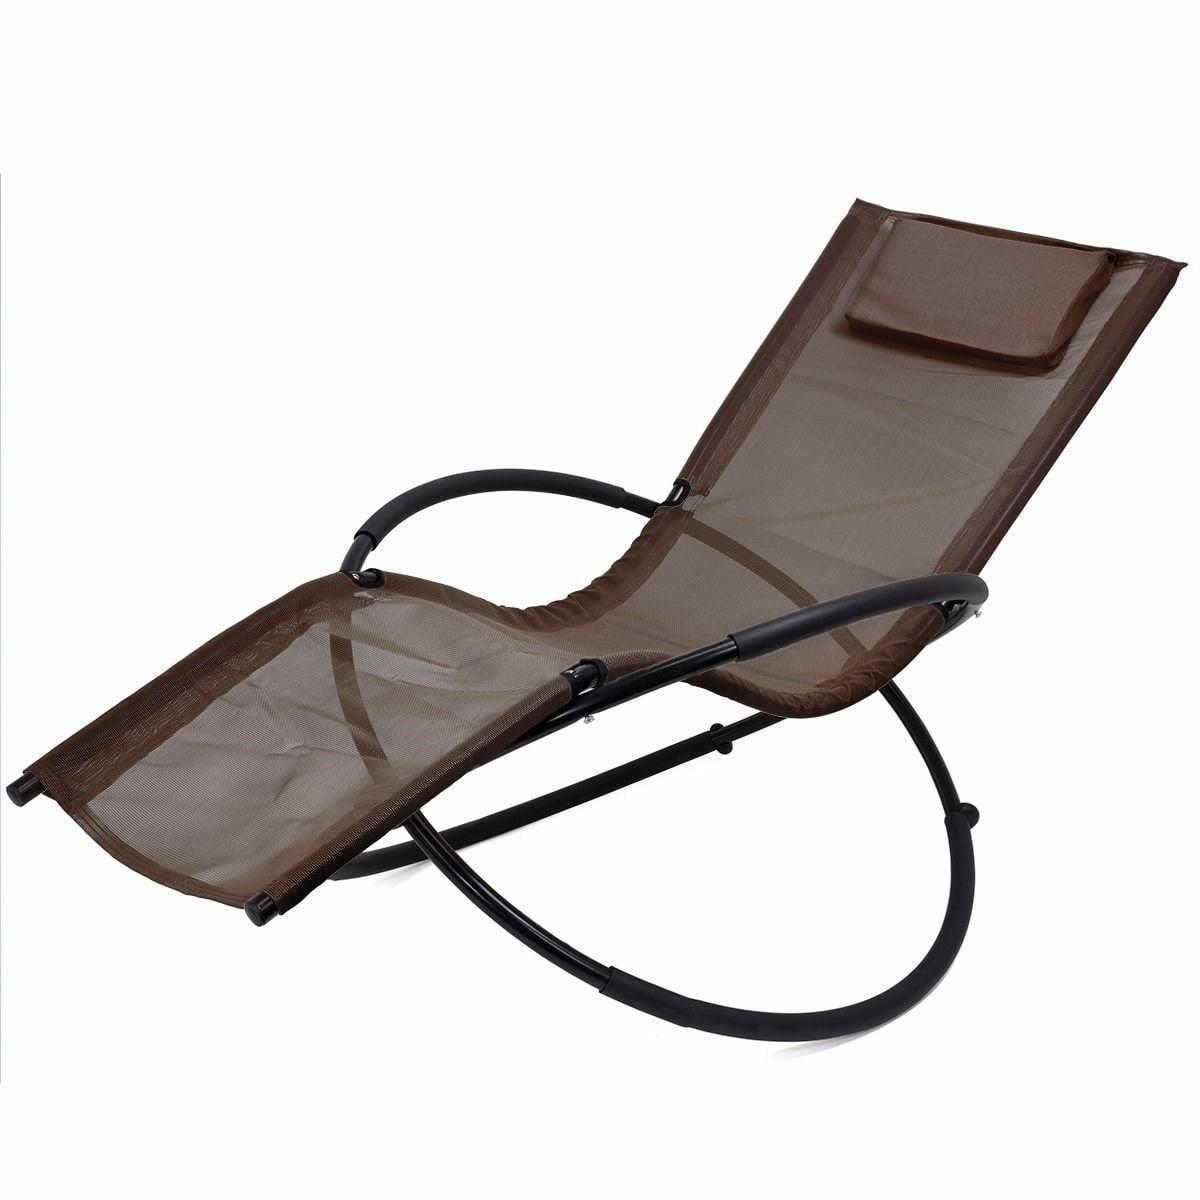 New MTN-G Folding Orbit Zero Gravity Chair Patio garden L...